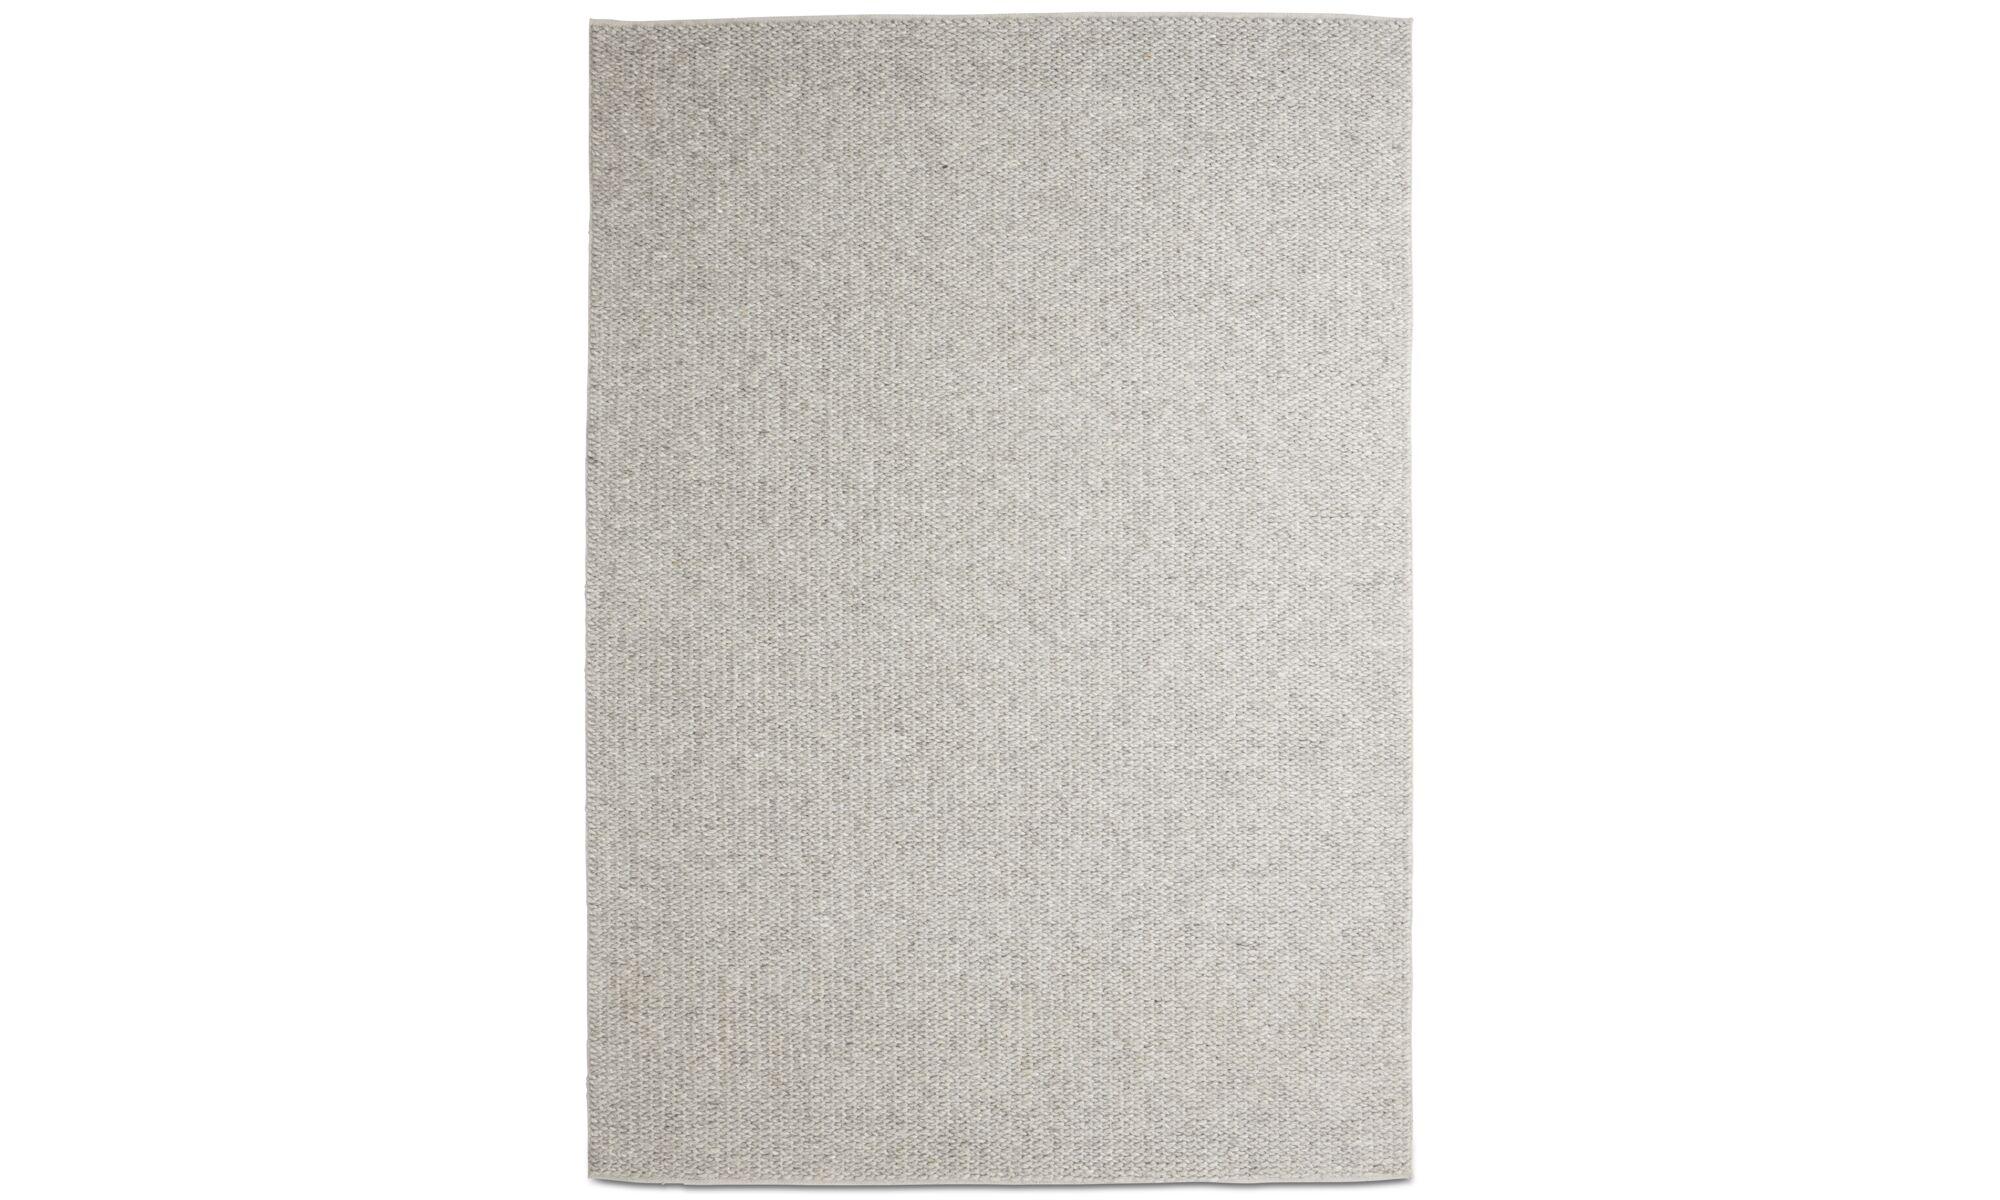 Teppiche - Scandinavia Teppich - rechteckig - Grau - Wolle